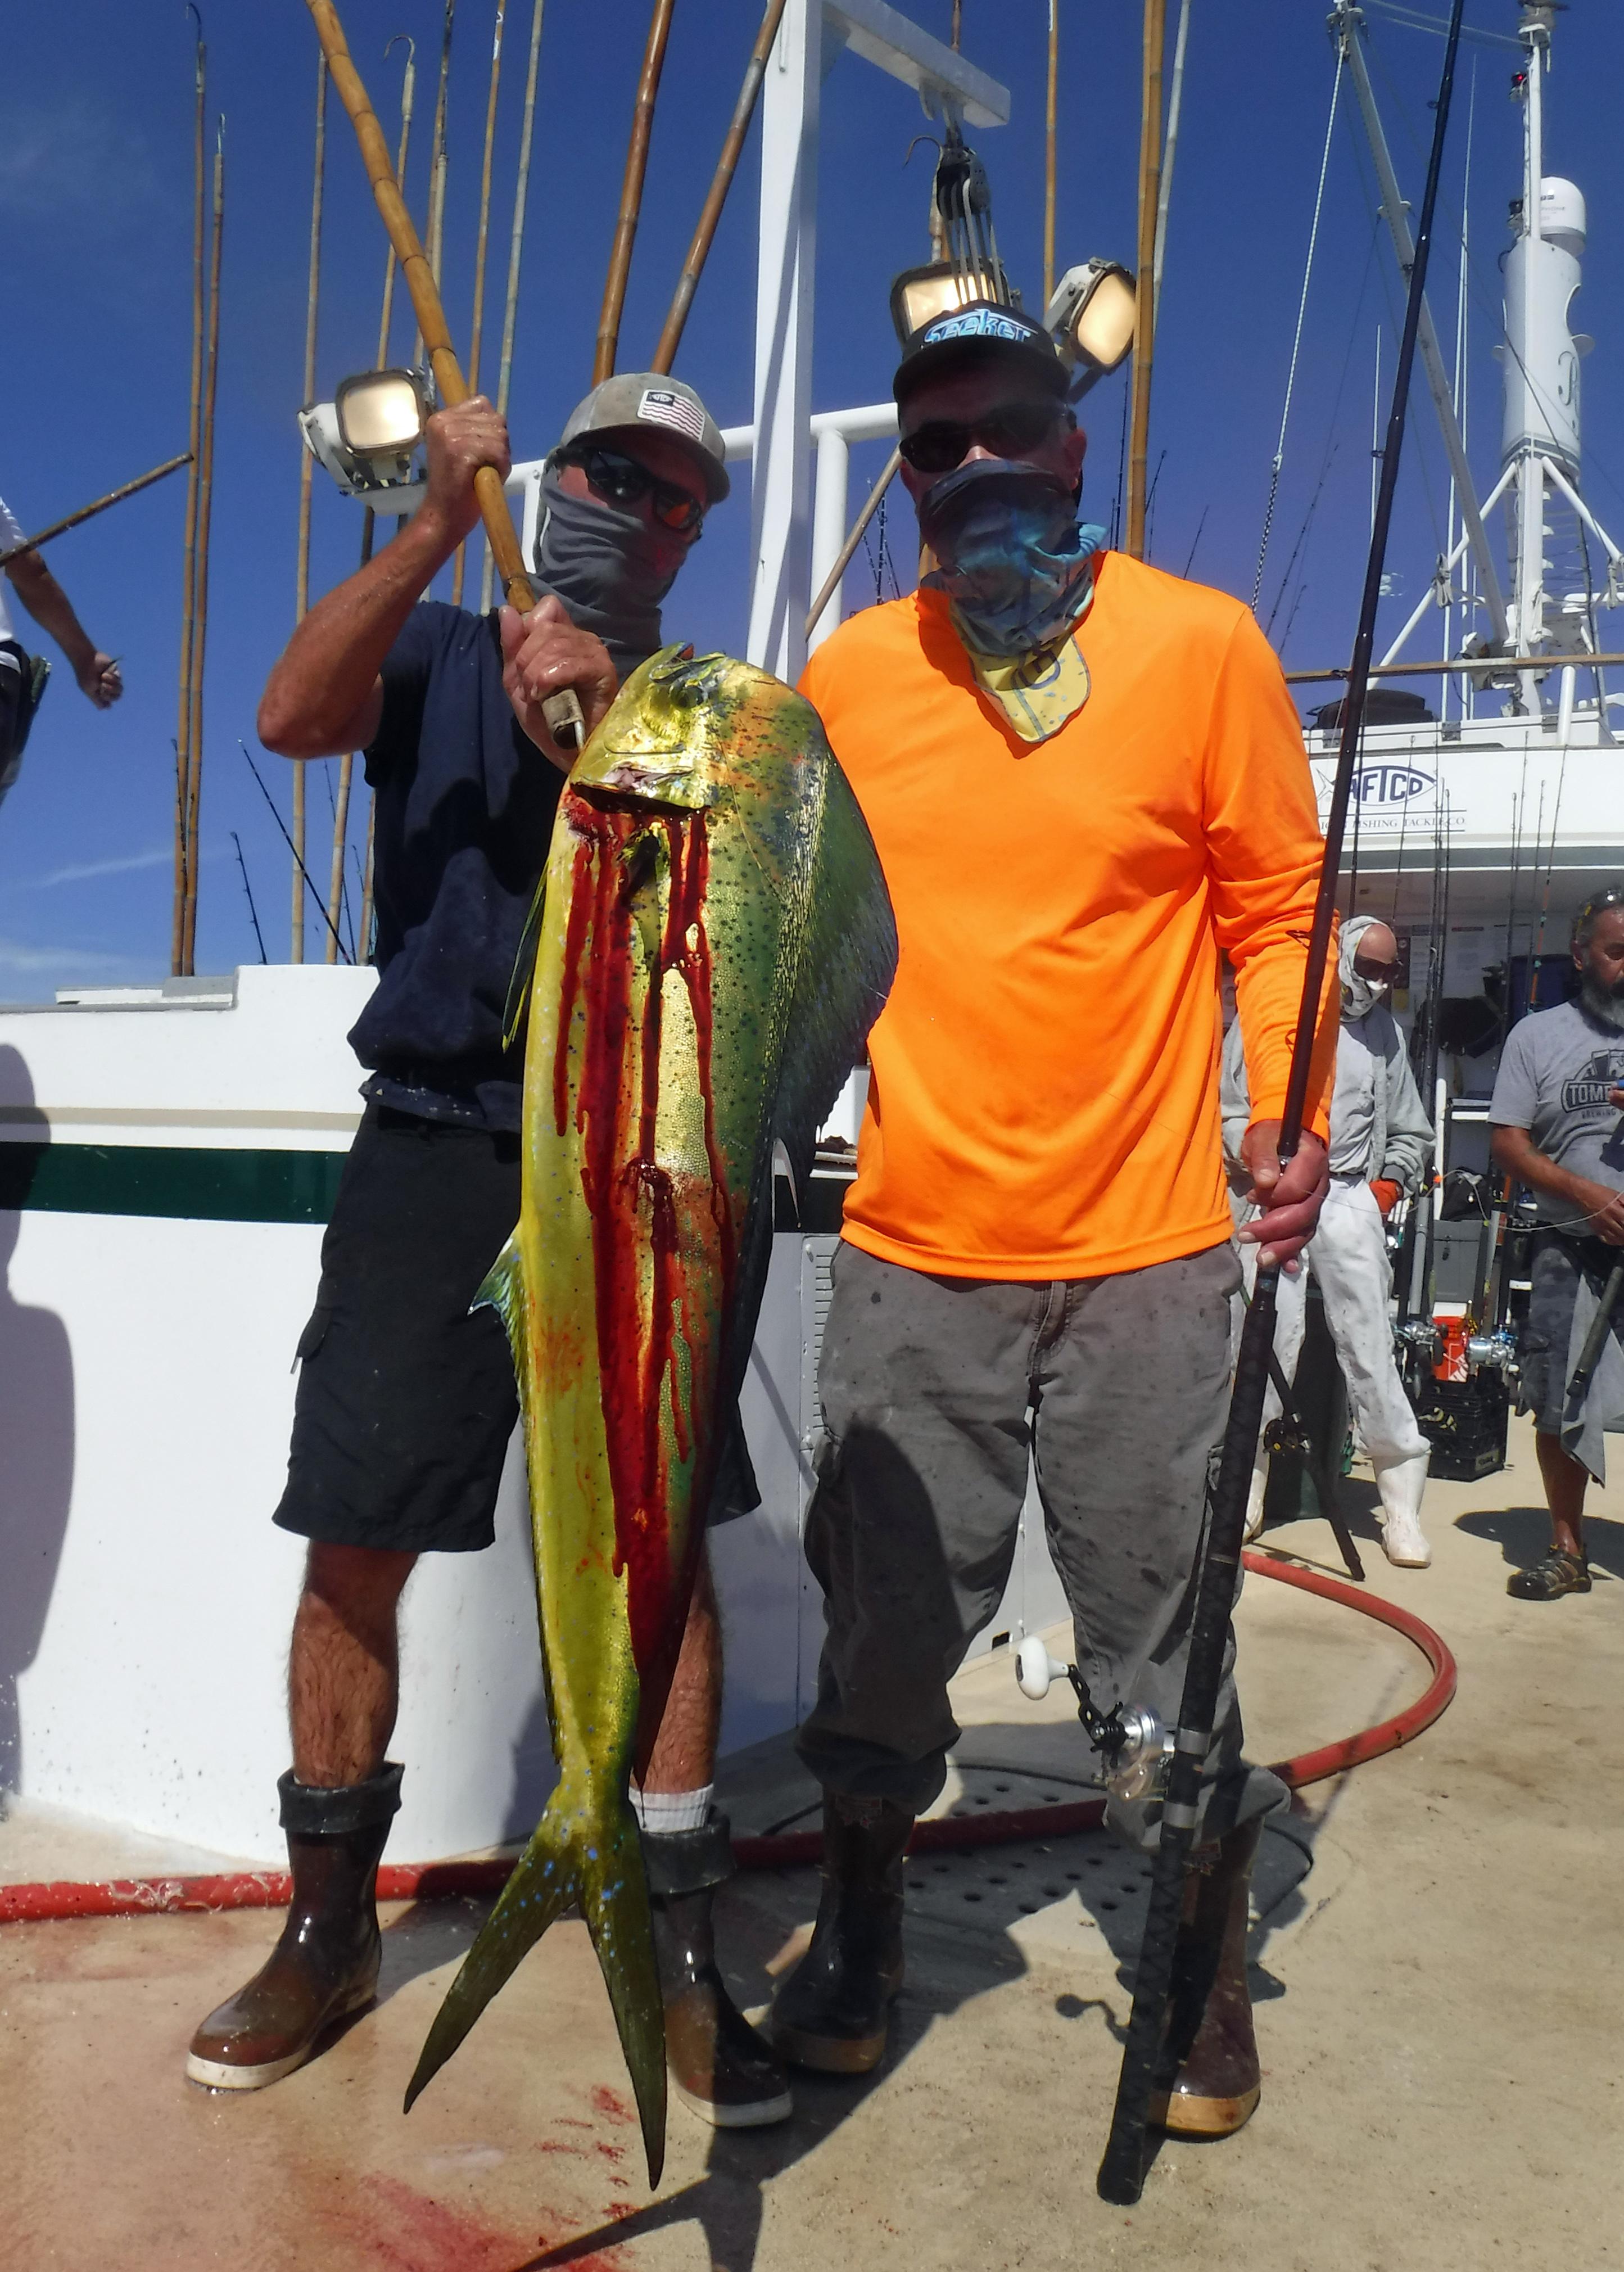 FISH ED AND MAHI DSCF7338.JPG